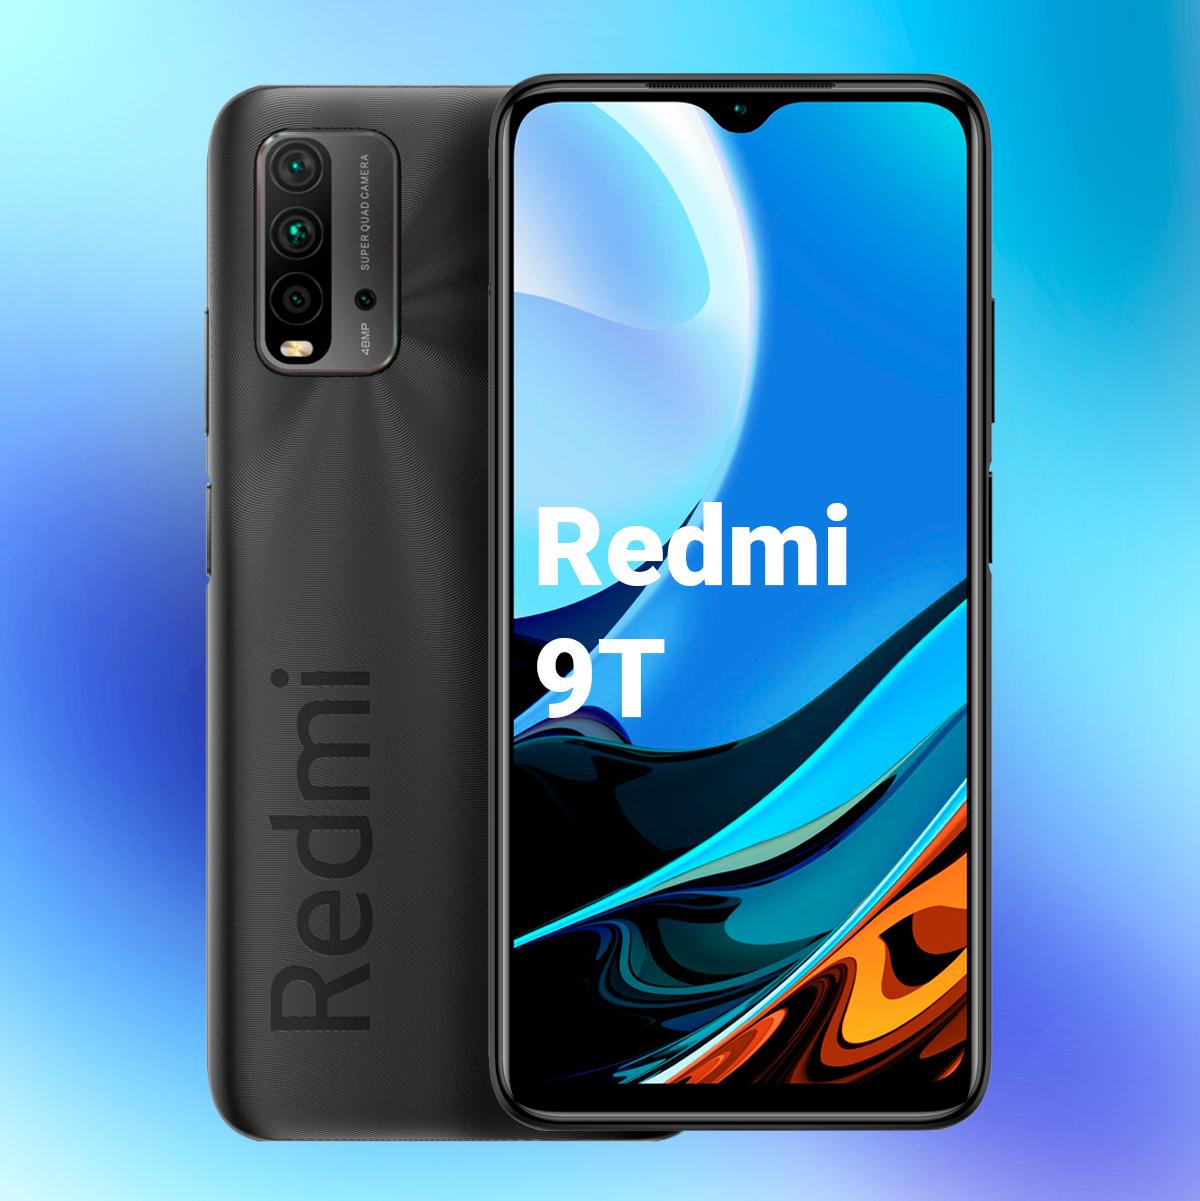 смартфон xiaomi redmi 9t 128 гб. 4/128gb, серый